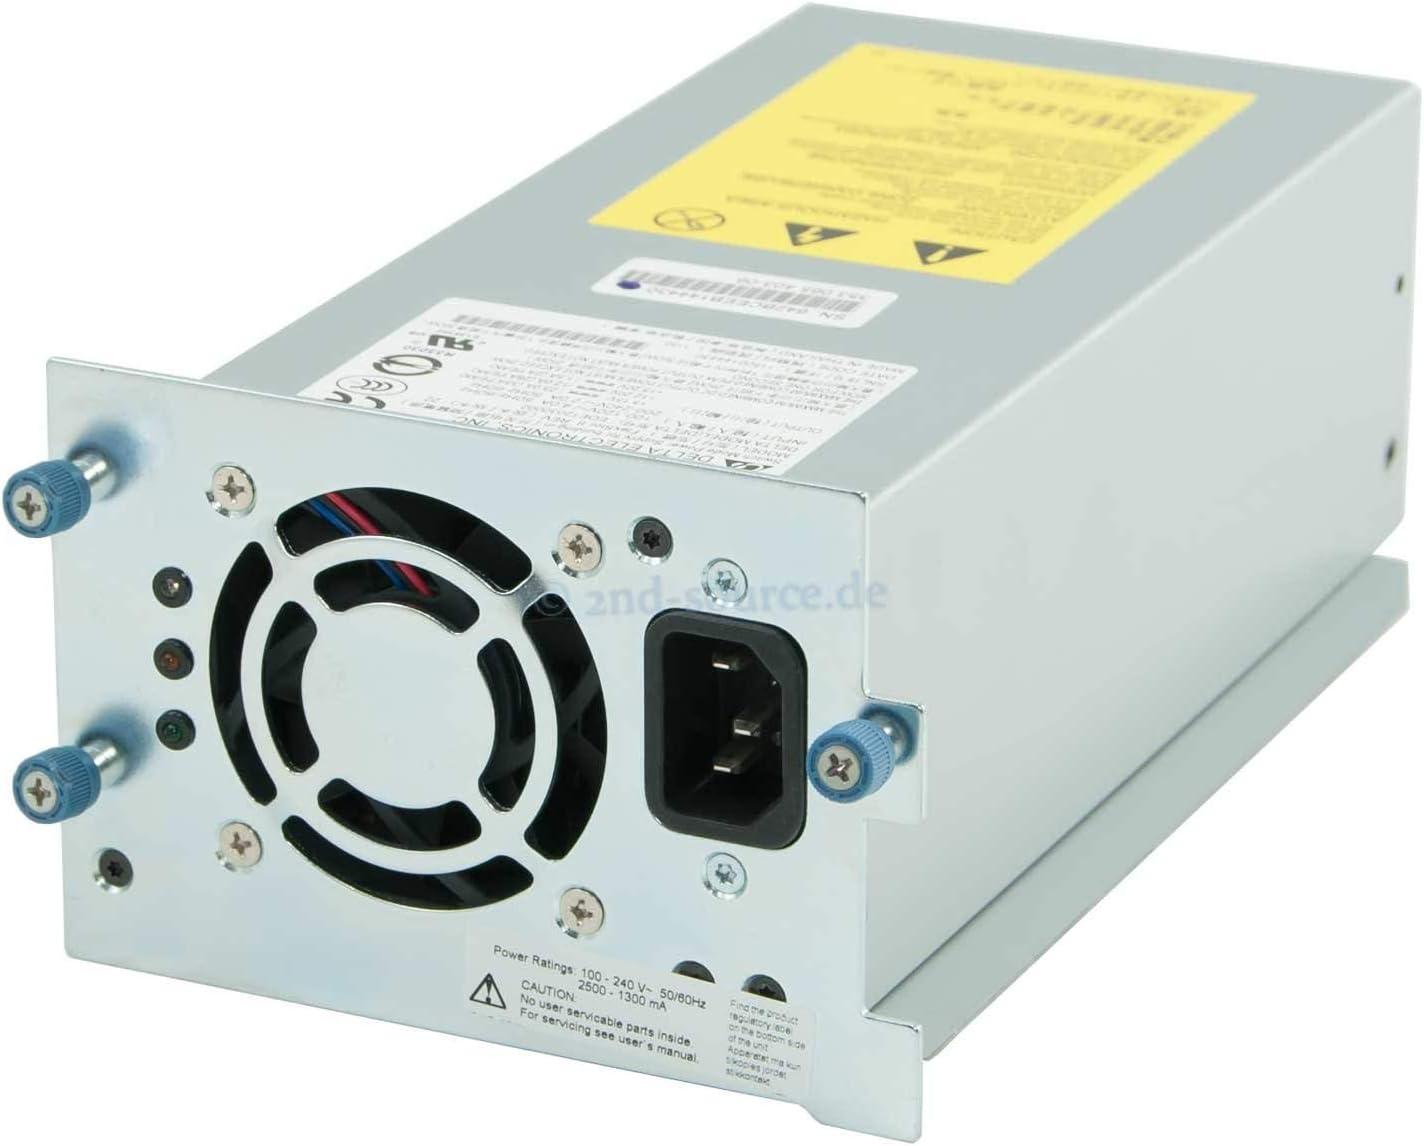 AH220A HP 440328-001 312W Redundant Power Supply